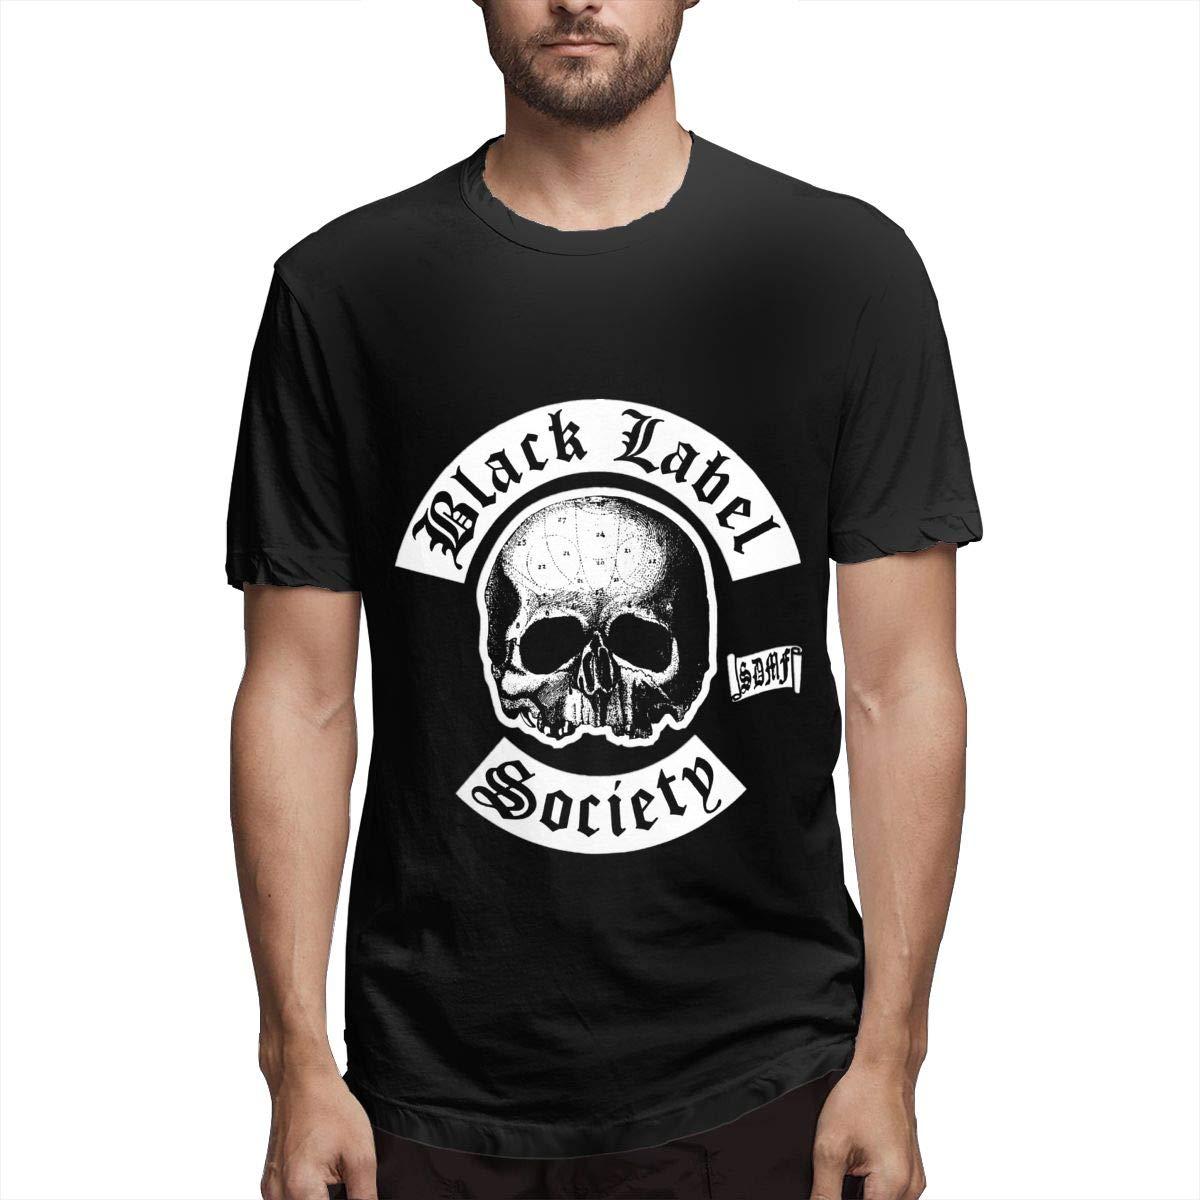 Lihehen Mans Black Label Society Logo Simple Casual Round Neck Shirts